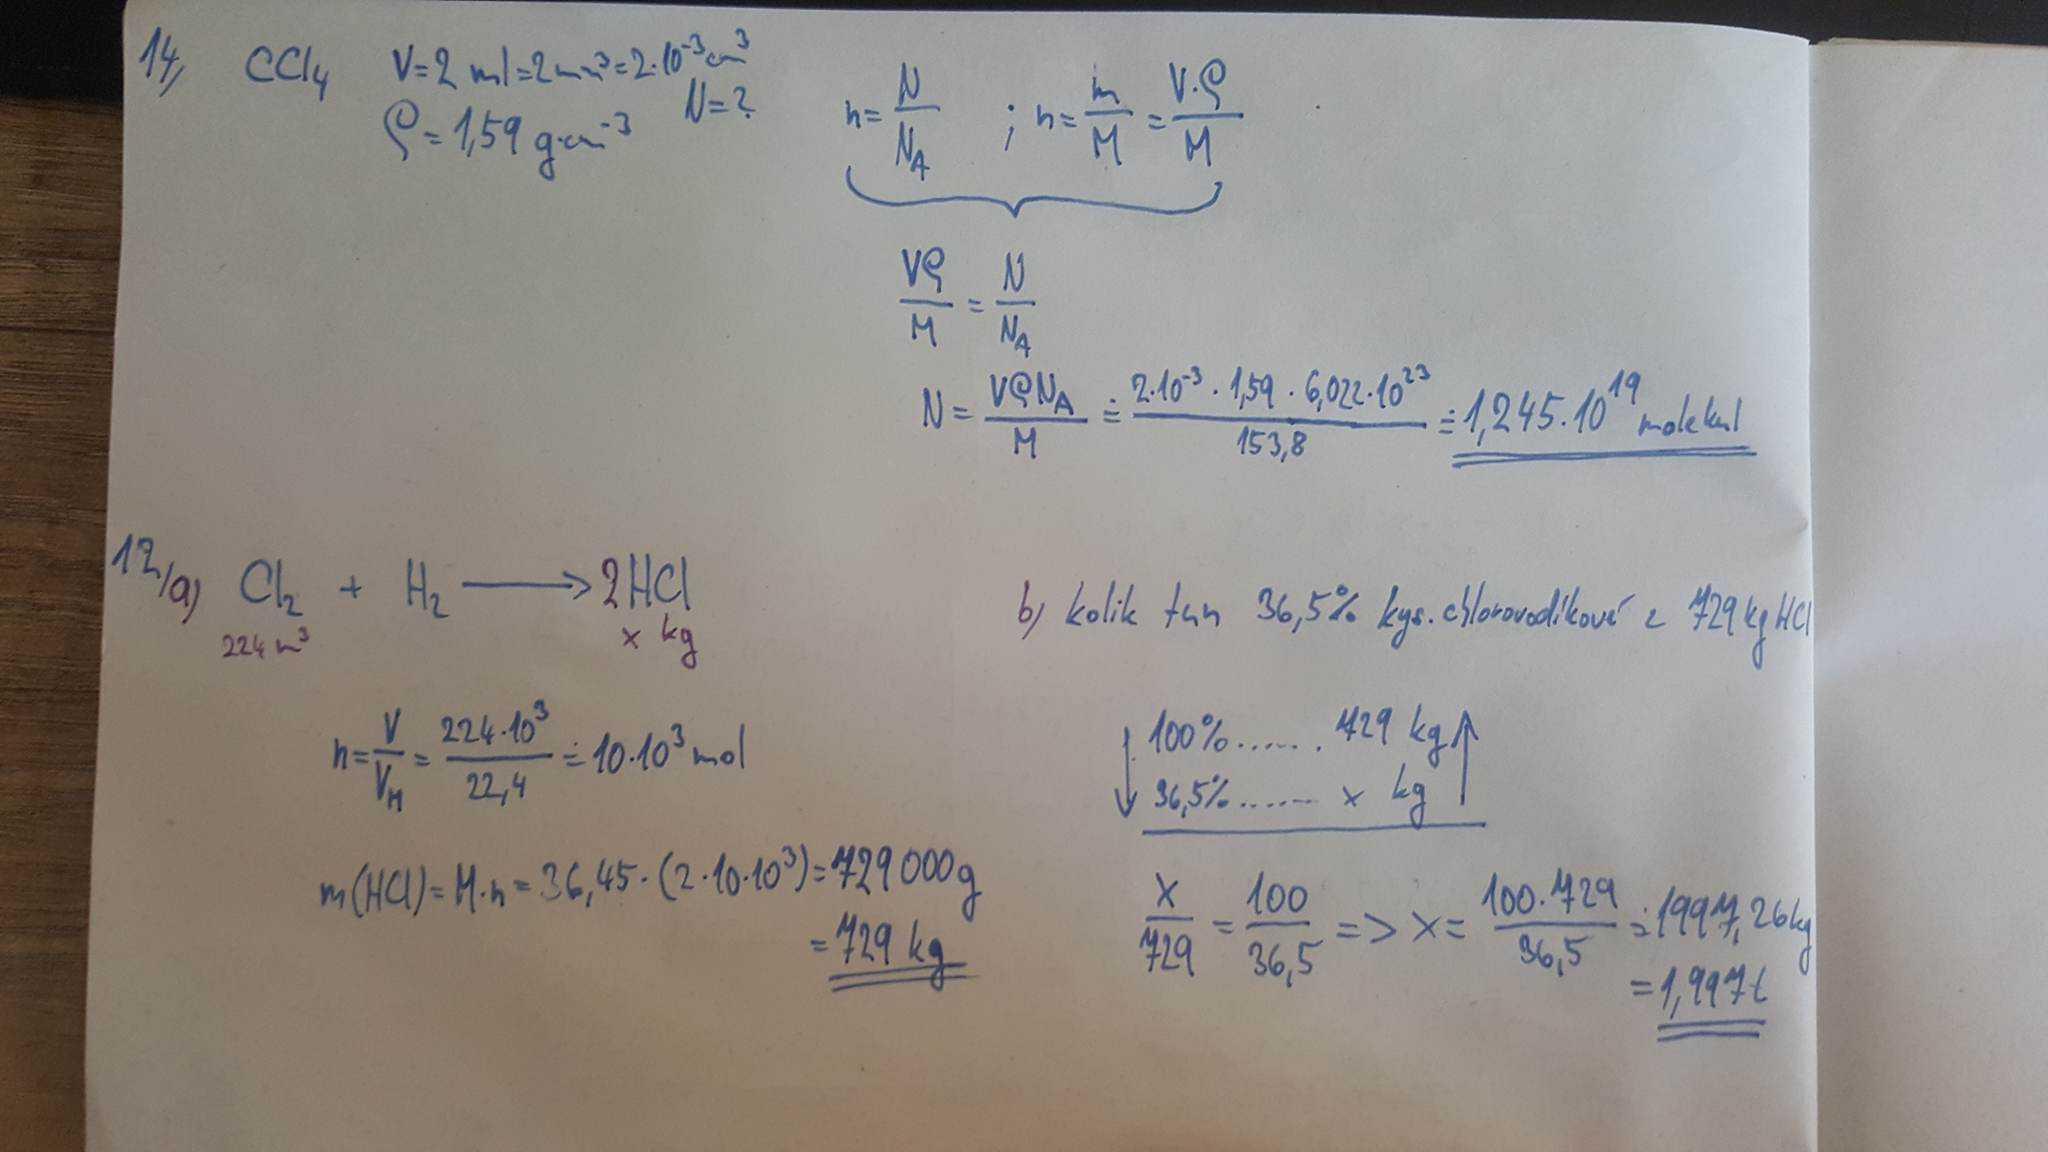 http://forum.matematika.cz/upload3/img/2017-12/58688_25467712_1624937907564909_1000528874_o.jpg